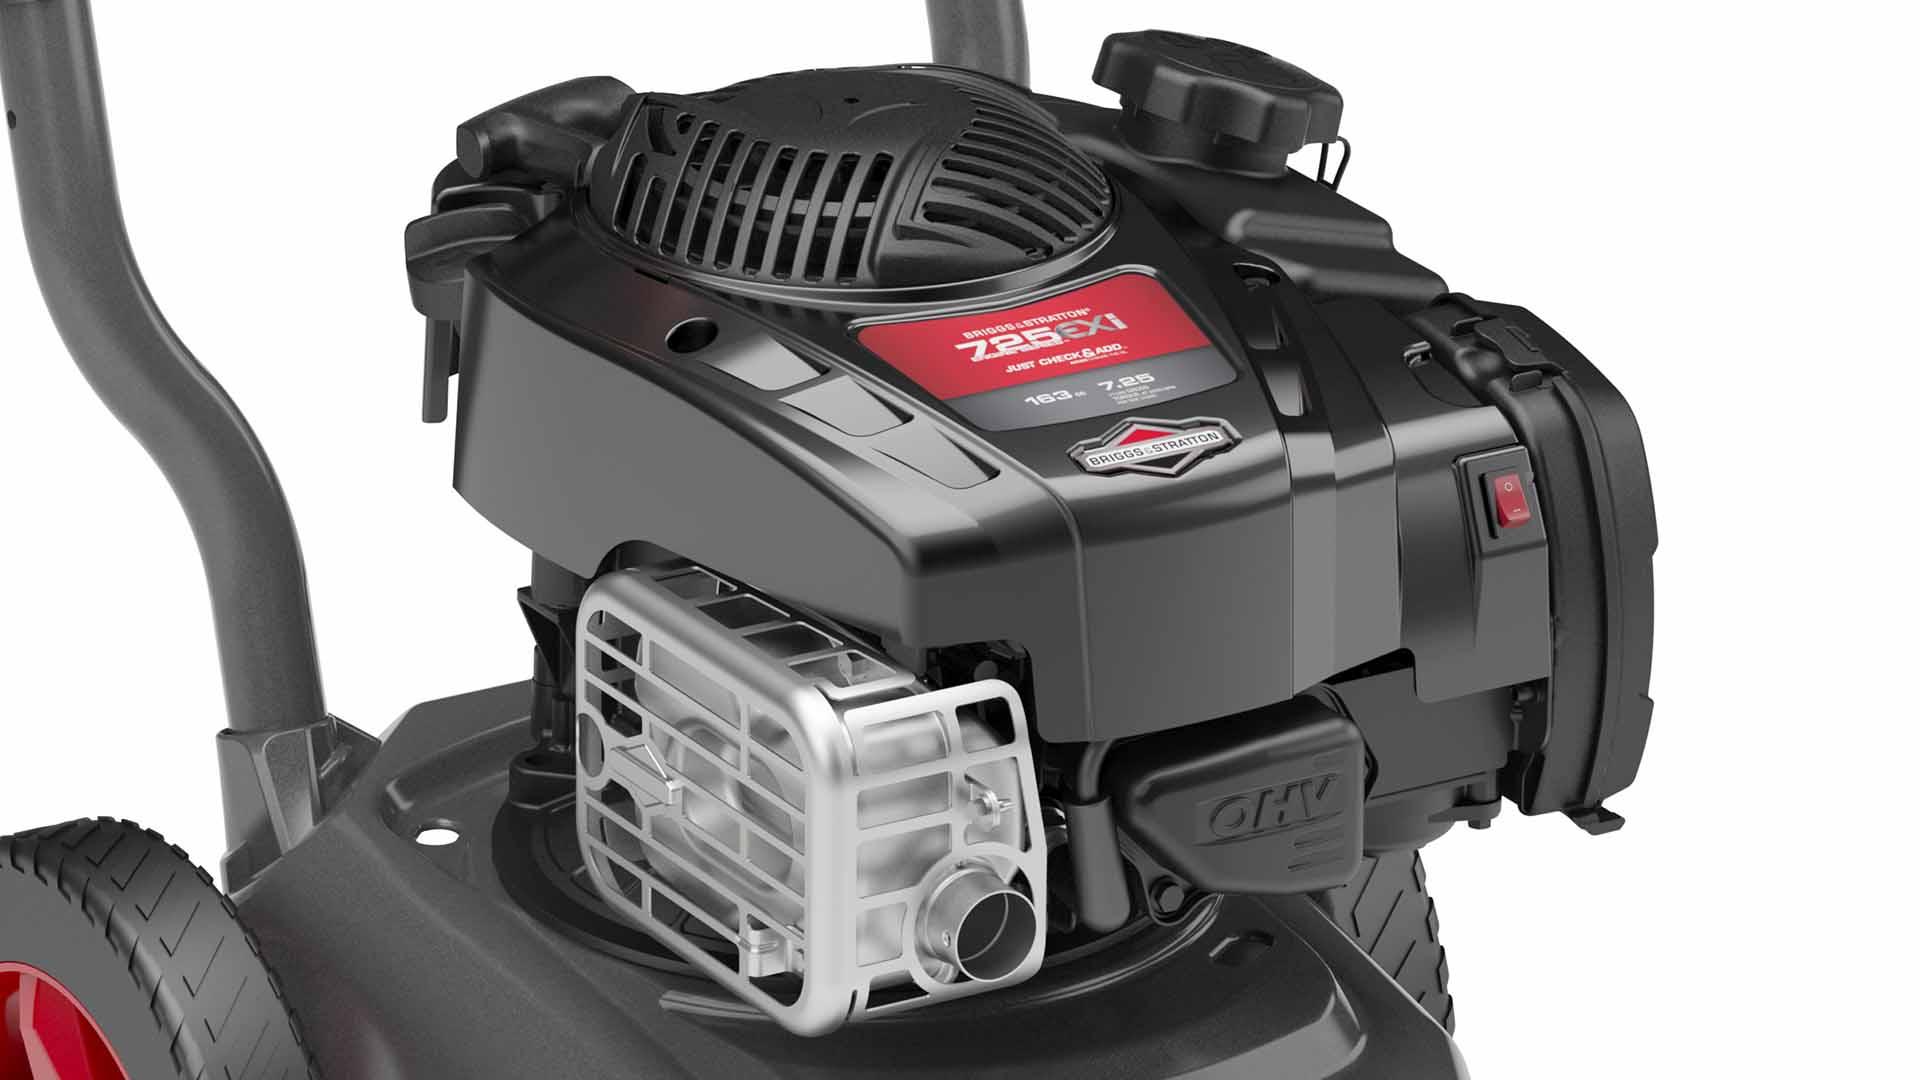 2800 Max Psi 21 Gpm Diagram Parts List For Model 92500to9259901100280 Briggsstratton Briggs Stratton 725exi Series Engine